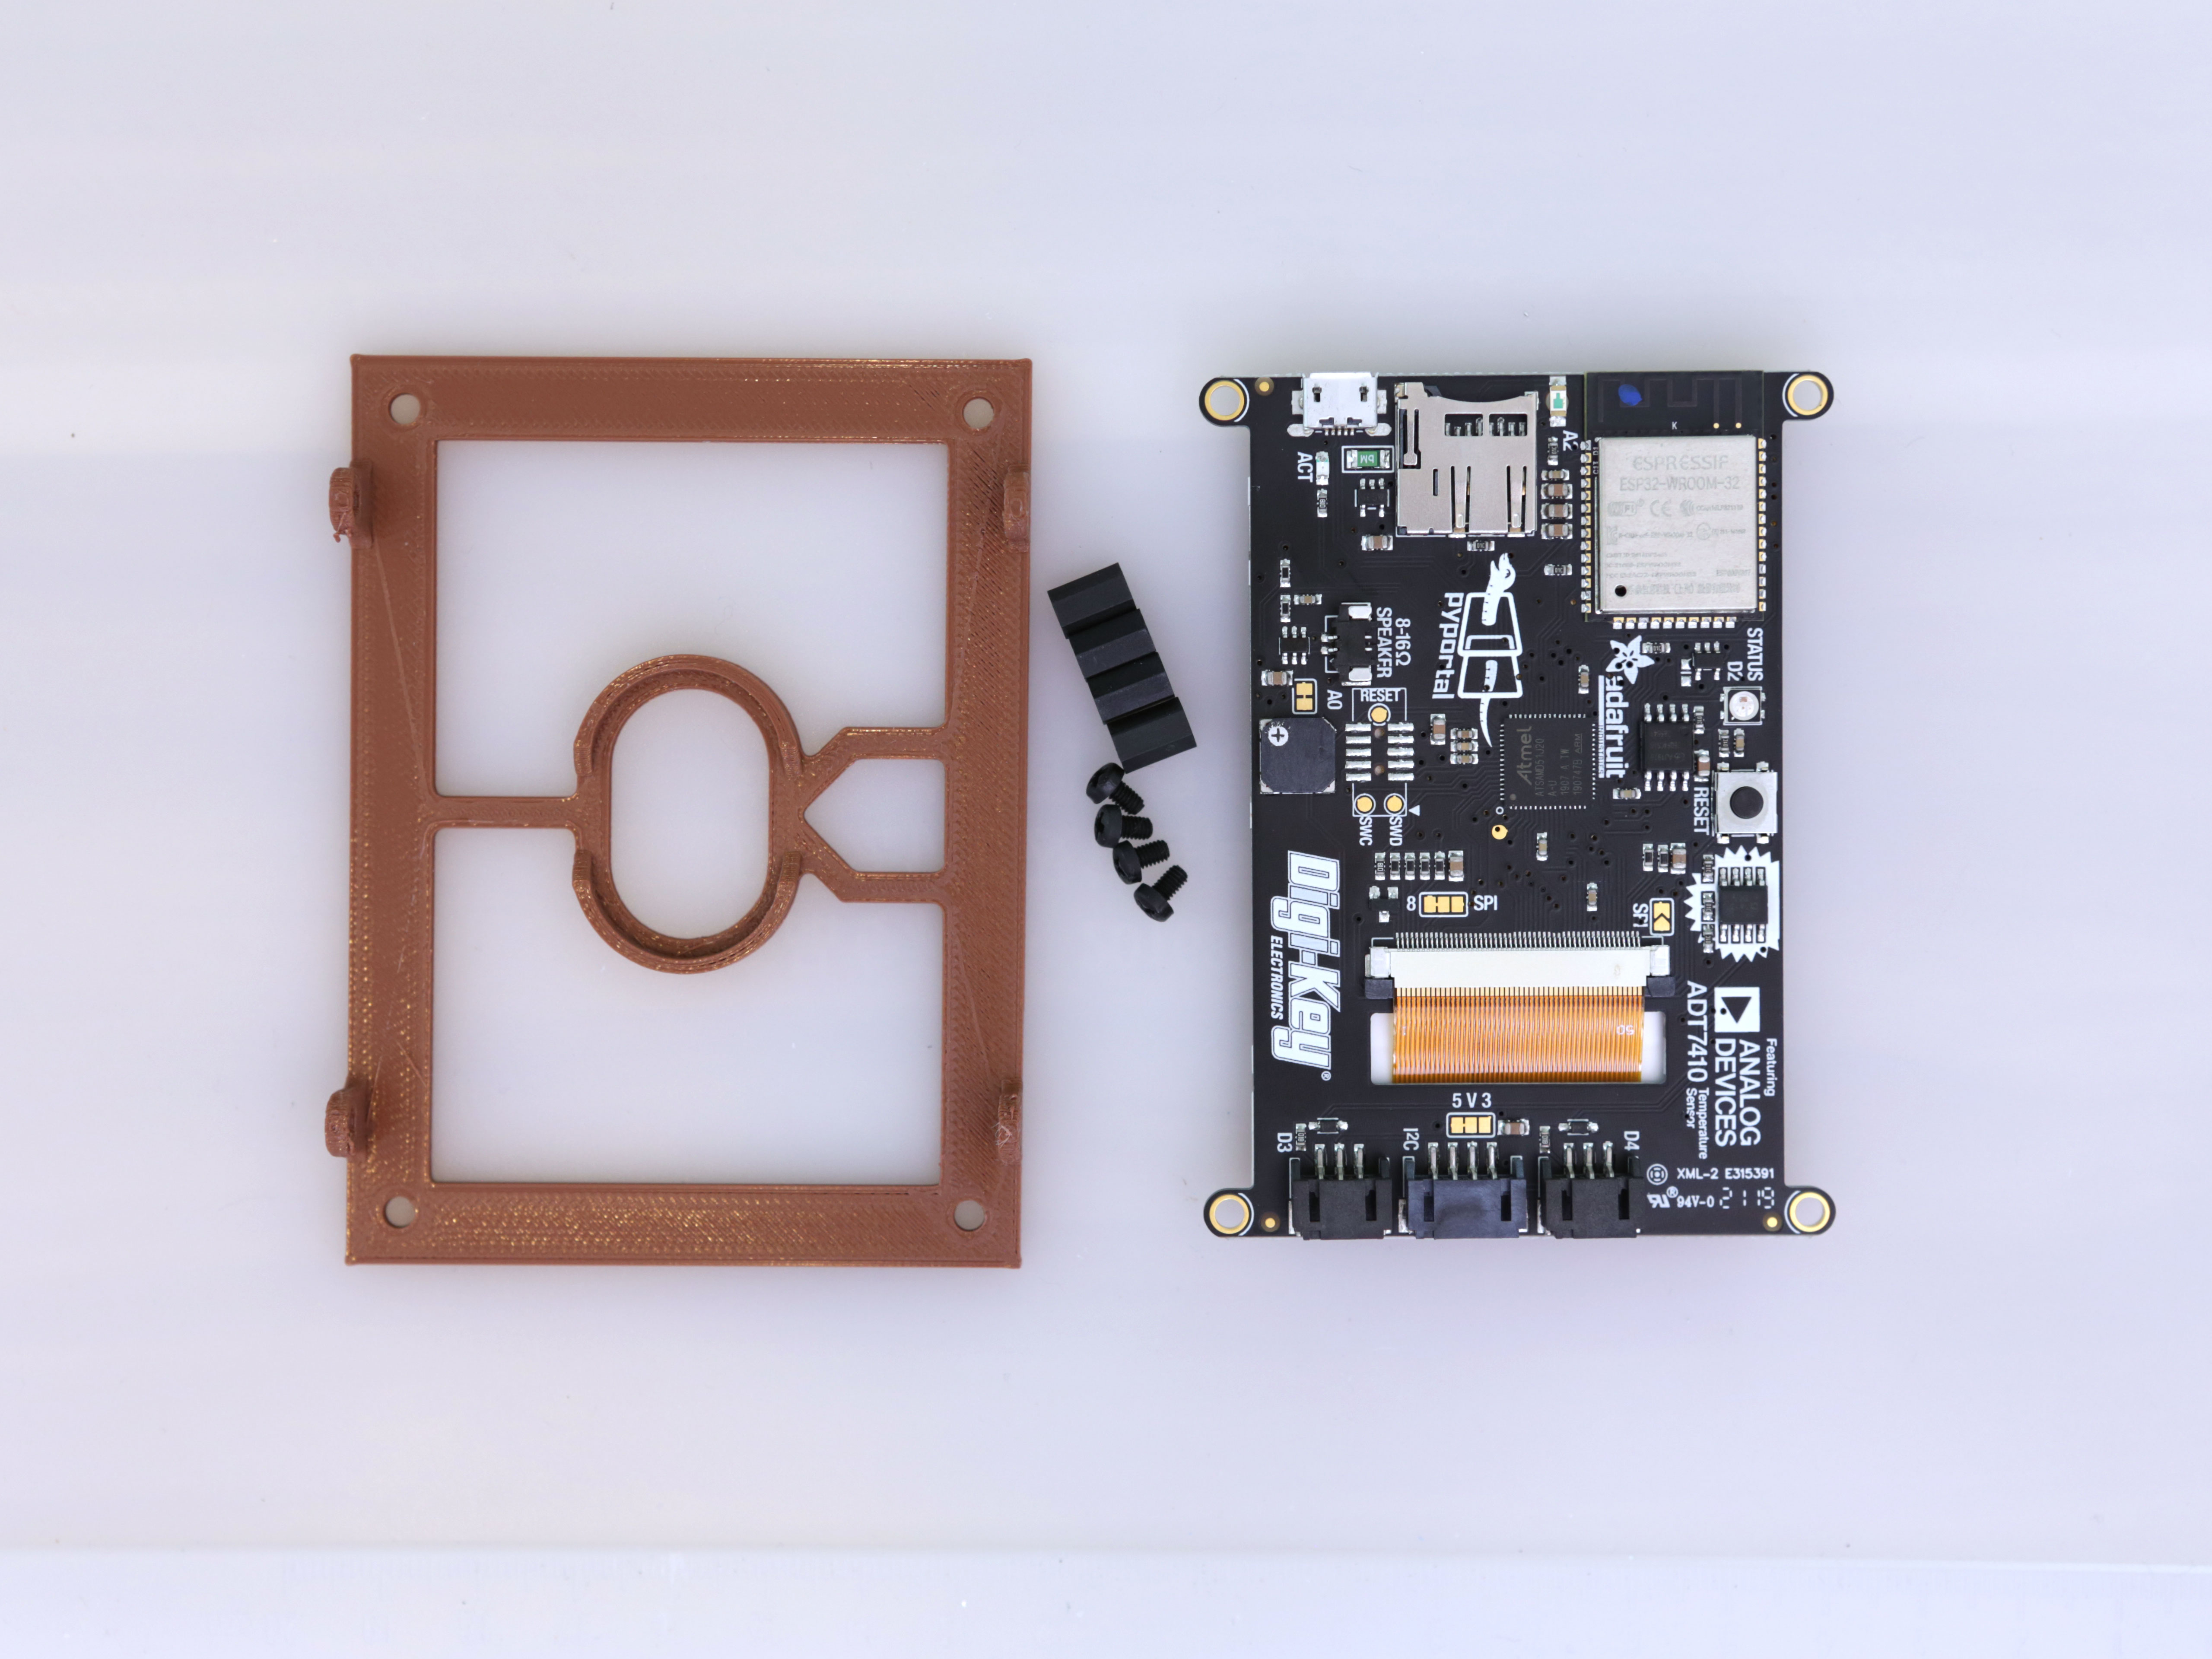 3d_printing_pcb-plate-screws.jpg